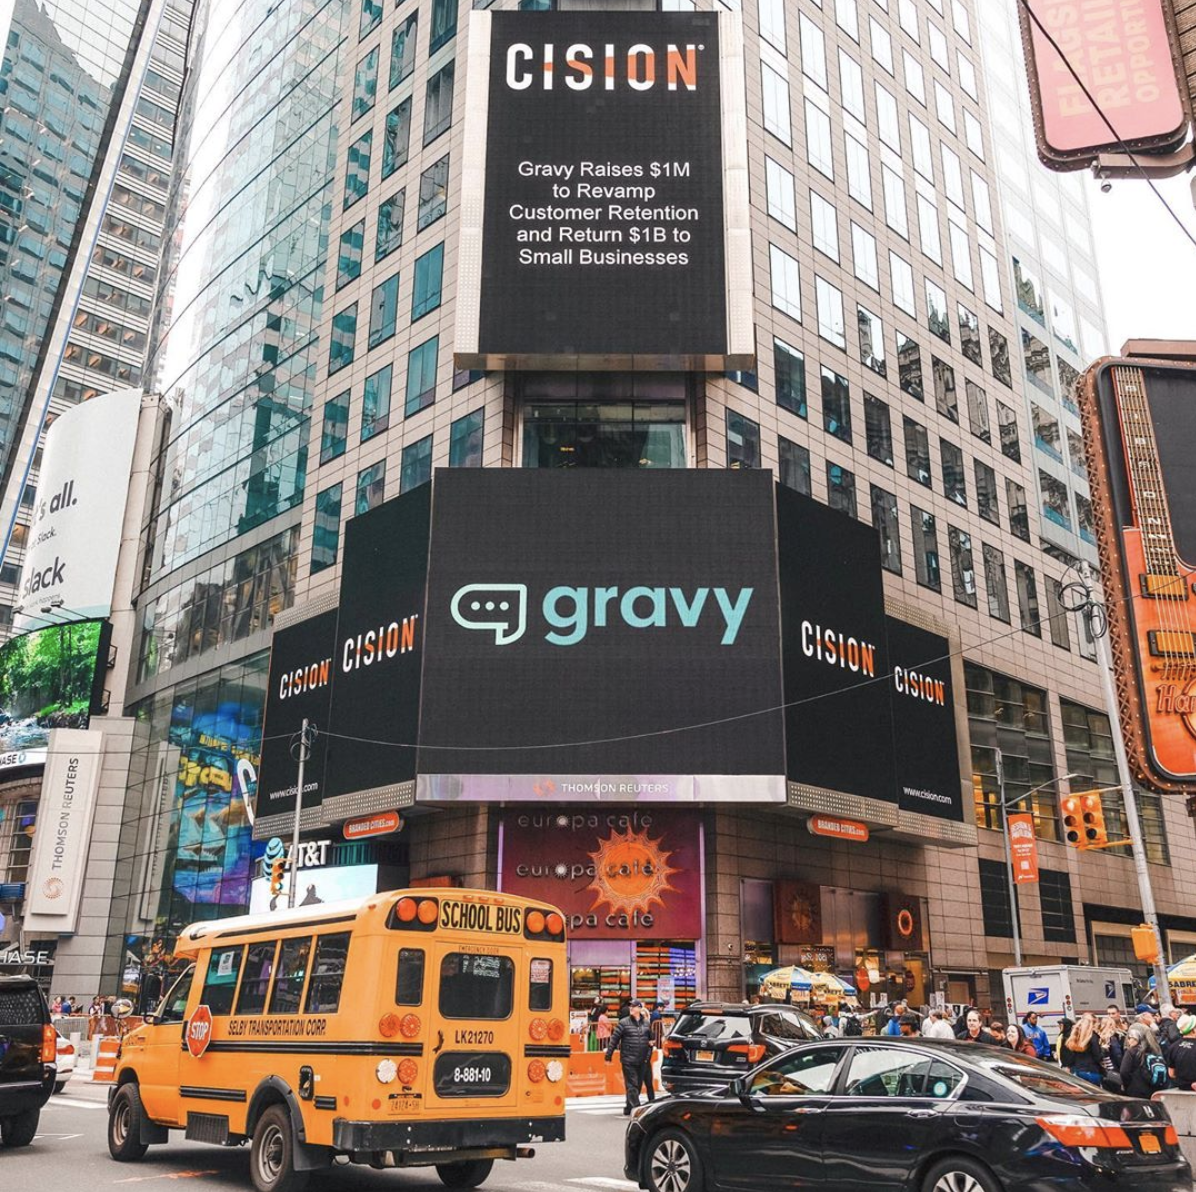 A NYC billboard displays the Gravy logo.